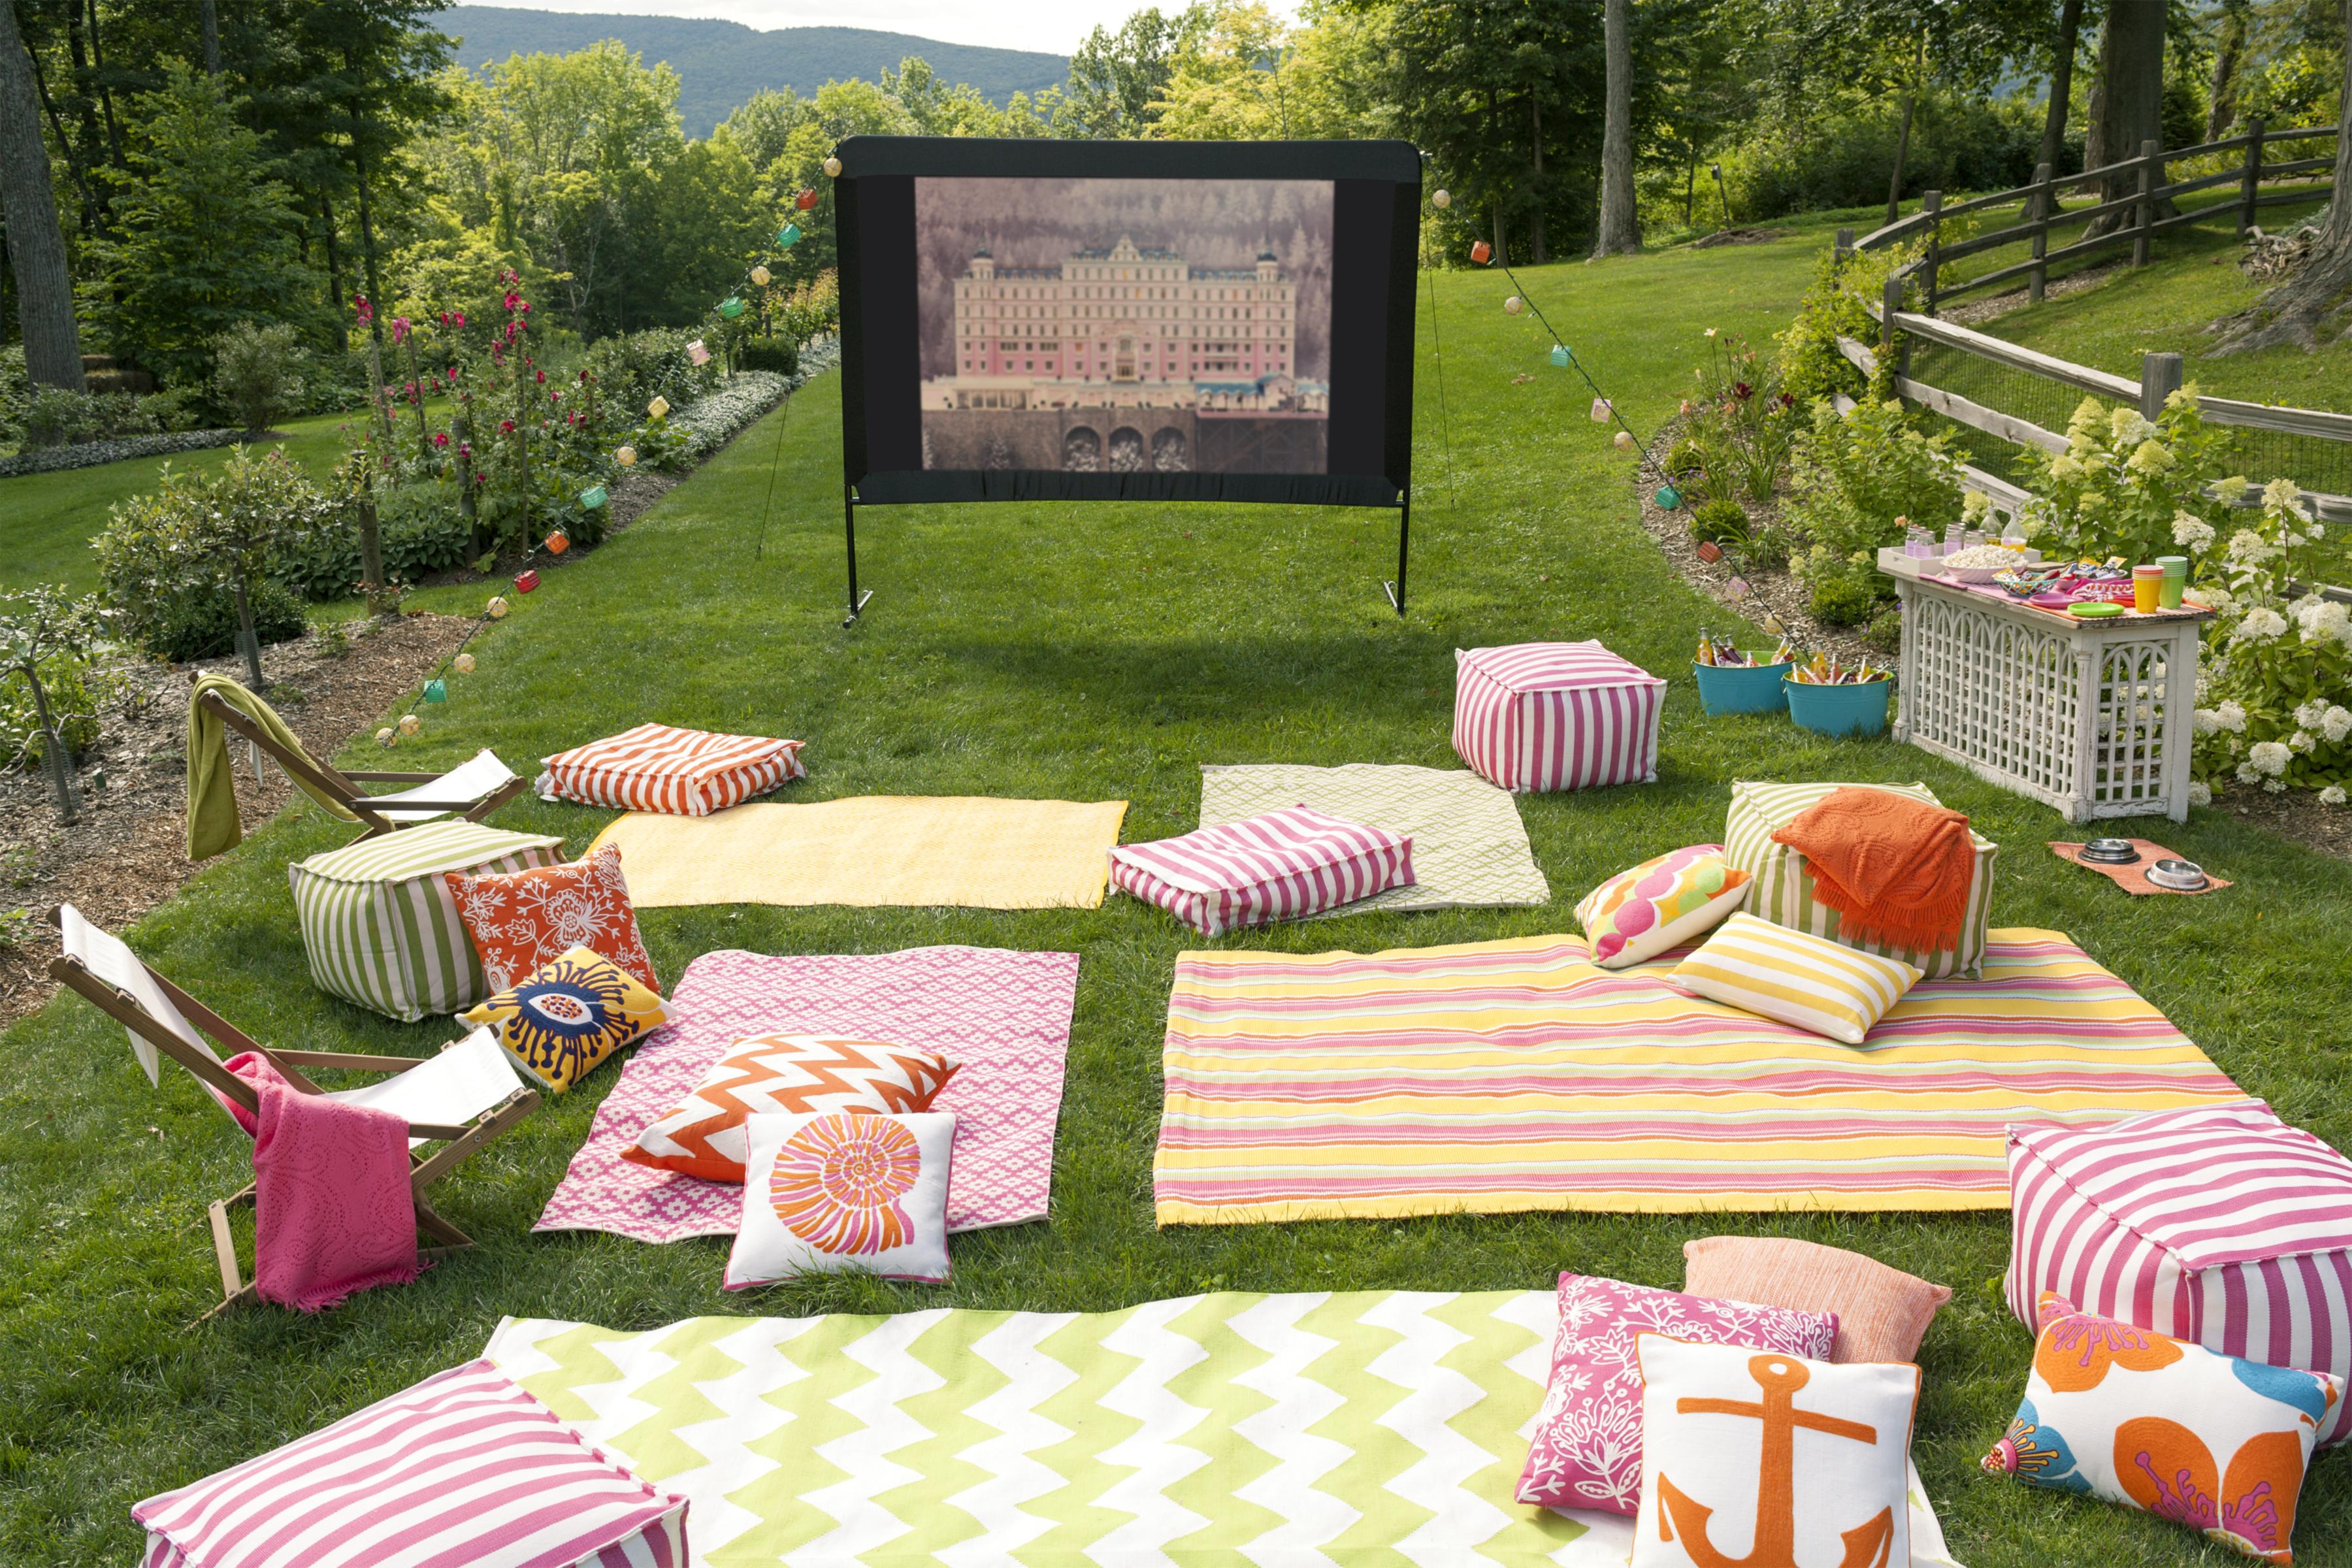 Genius Outdoor Movie Ideas